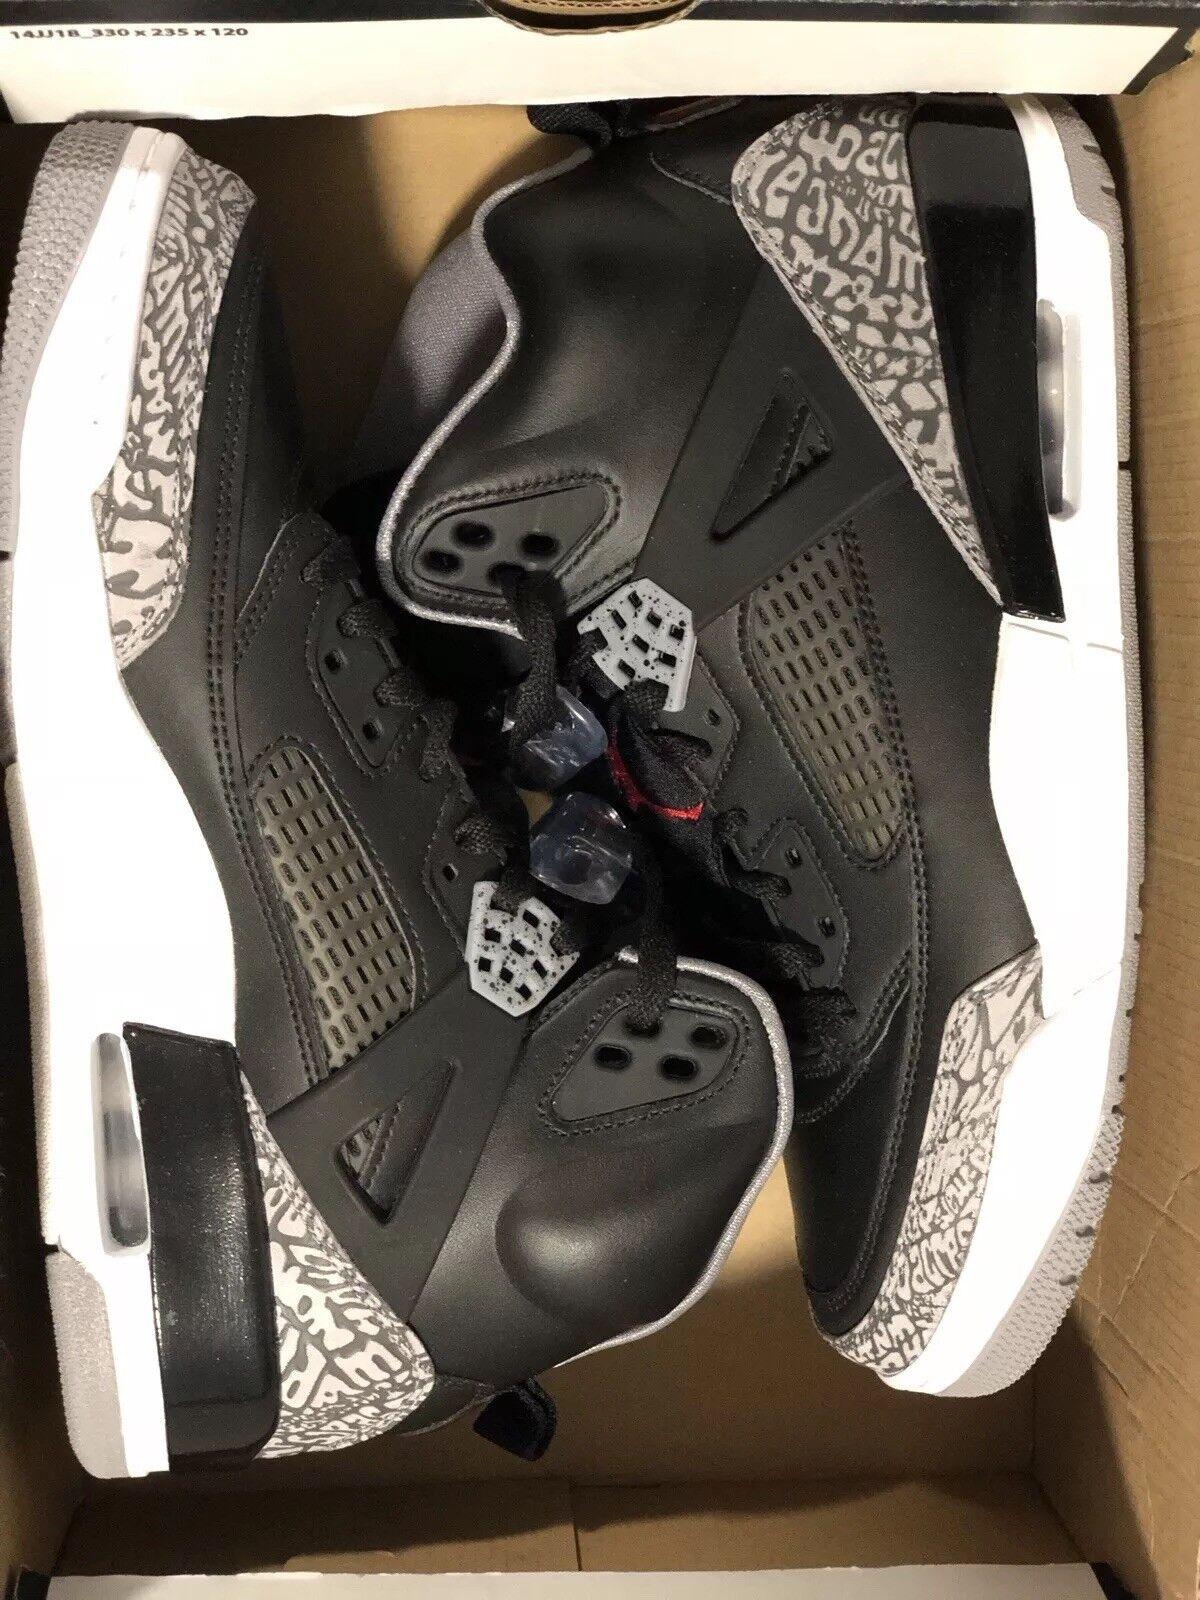 Air Jordan Spizike 315371-034 nero Varsity rosso Cement Cement Cement grigio Uomo scarpe Dimensione 9 abb9fc